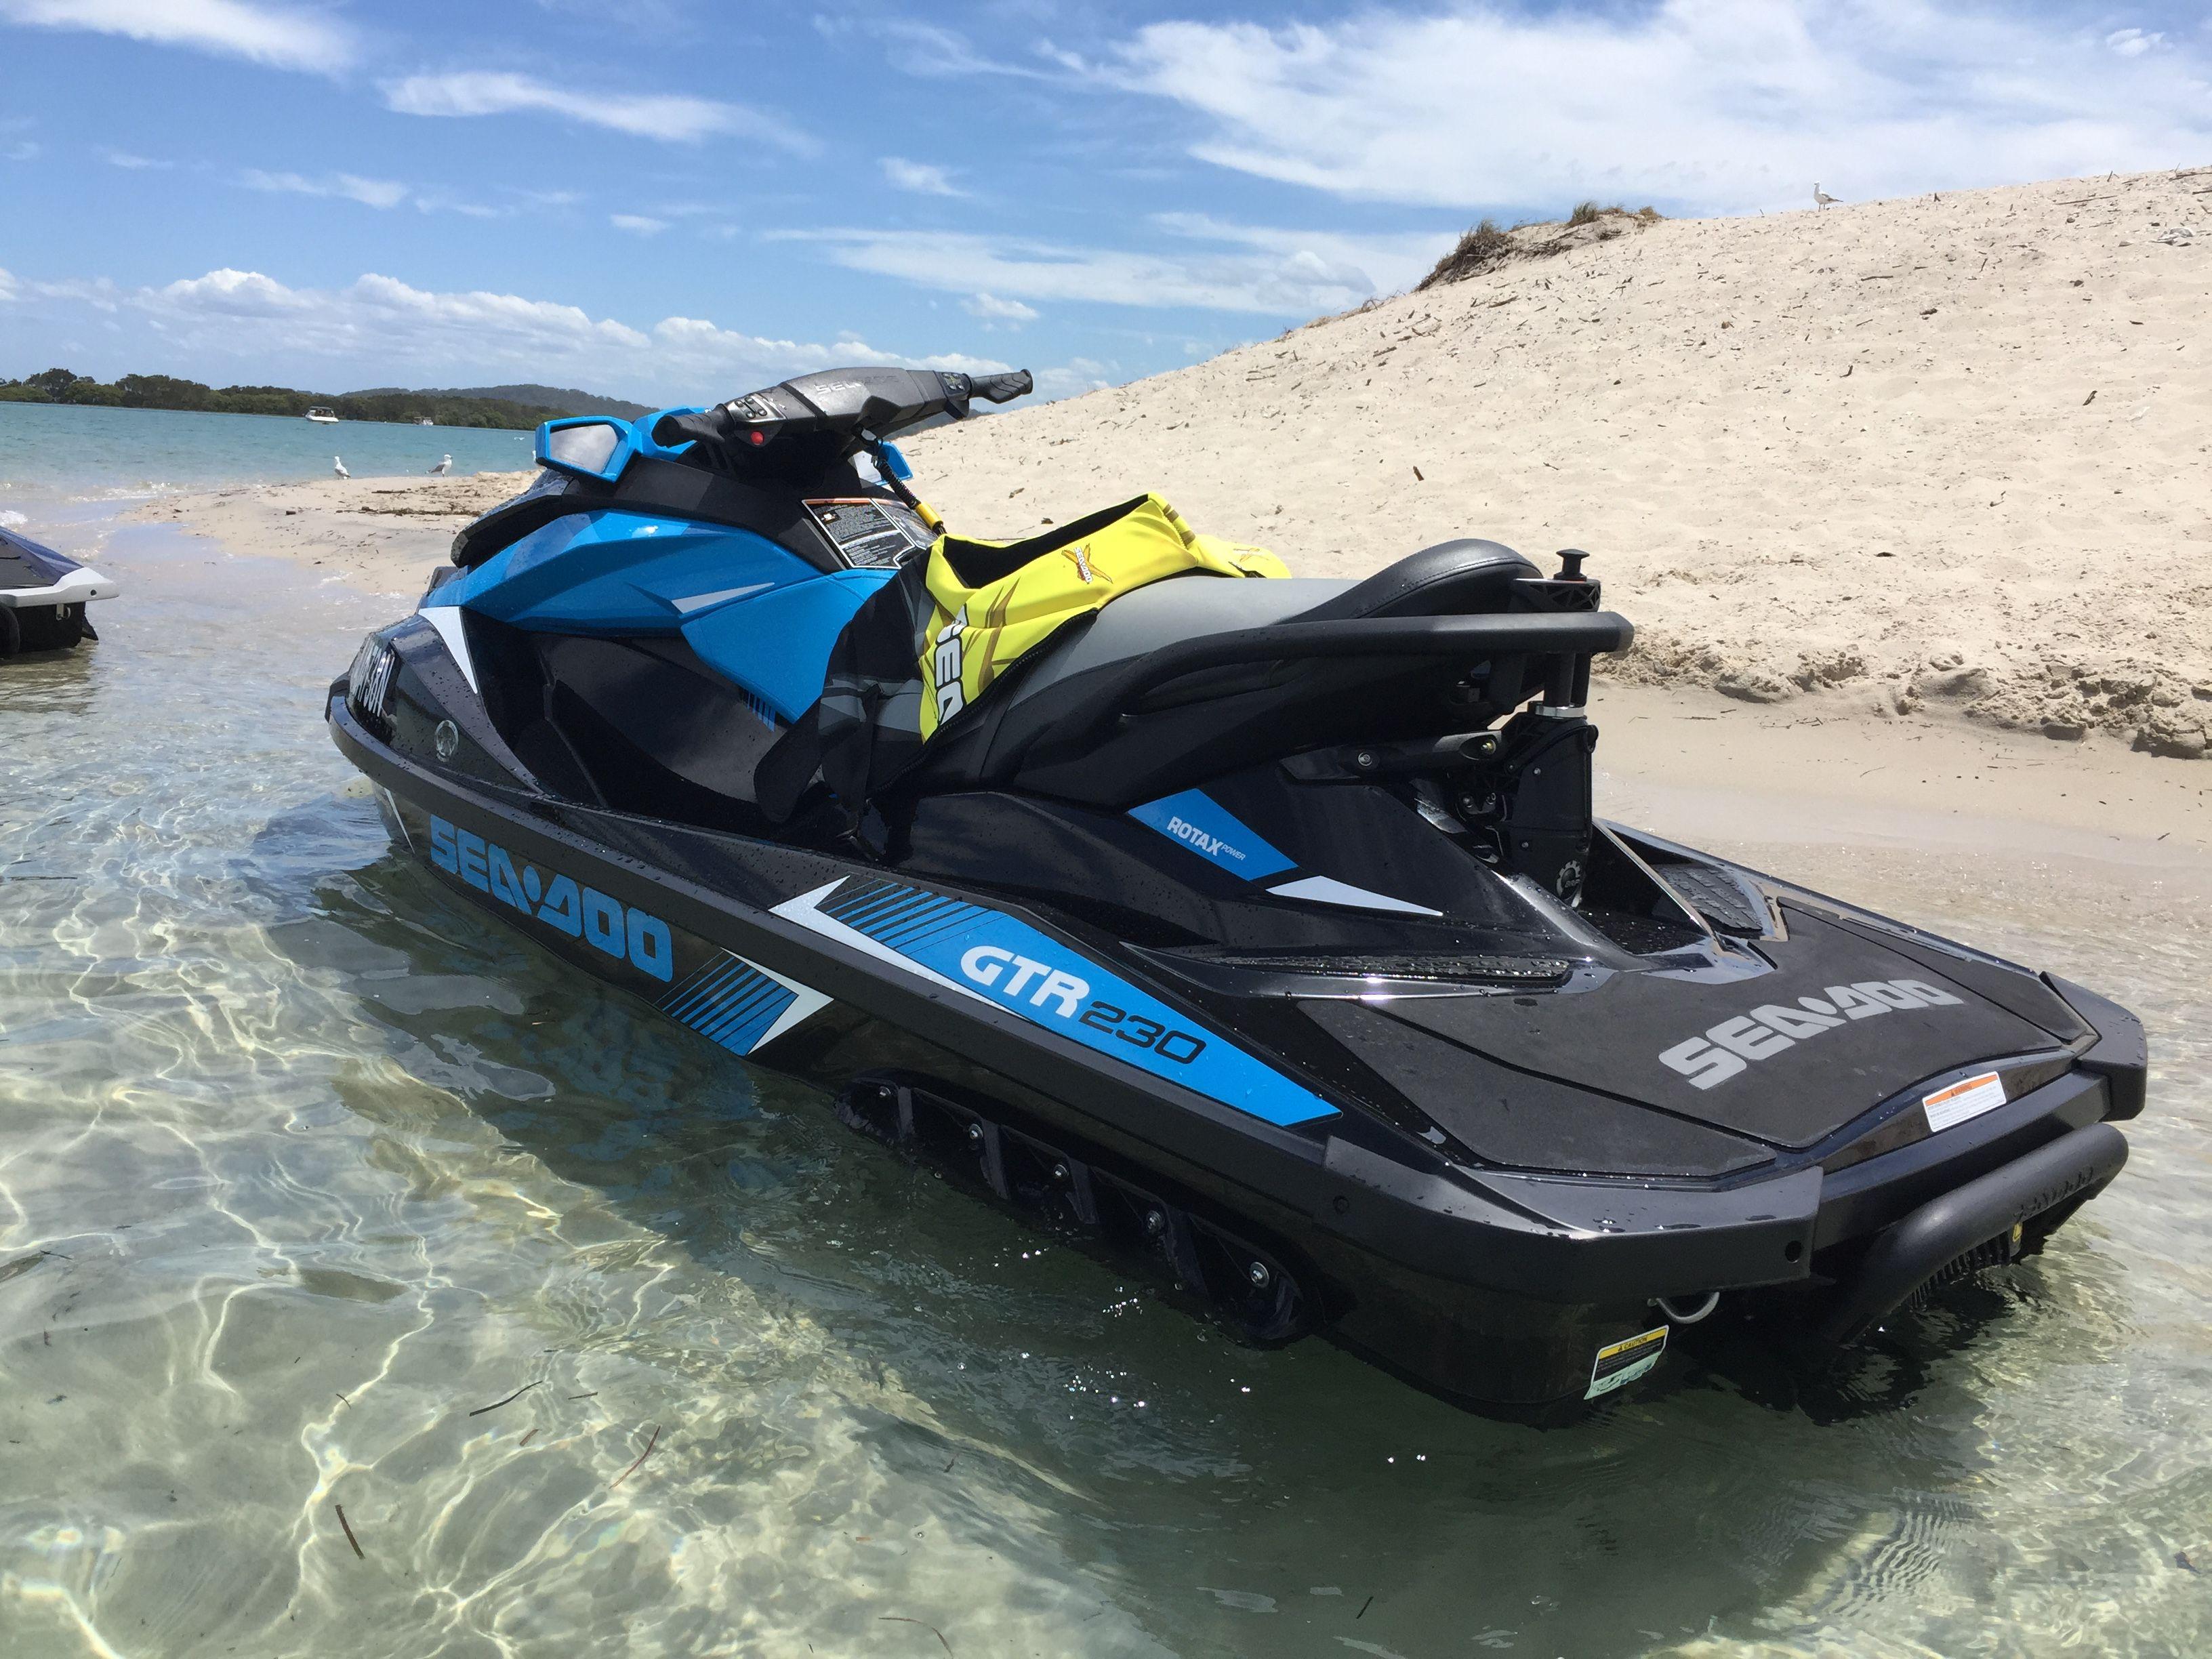 Pin By Danielle Leblanc On Water Life Ski Boats Jet Ski Wakeboarding